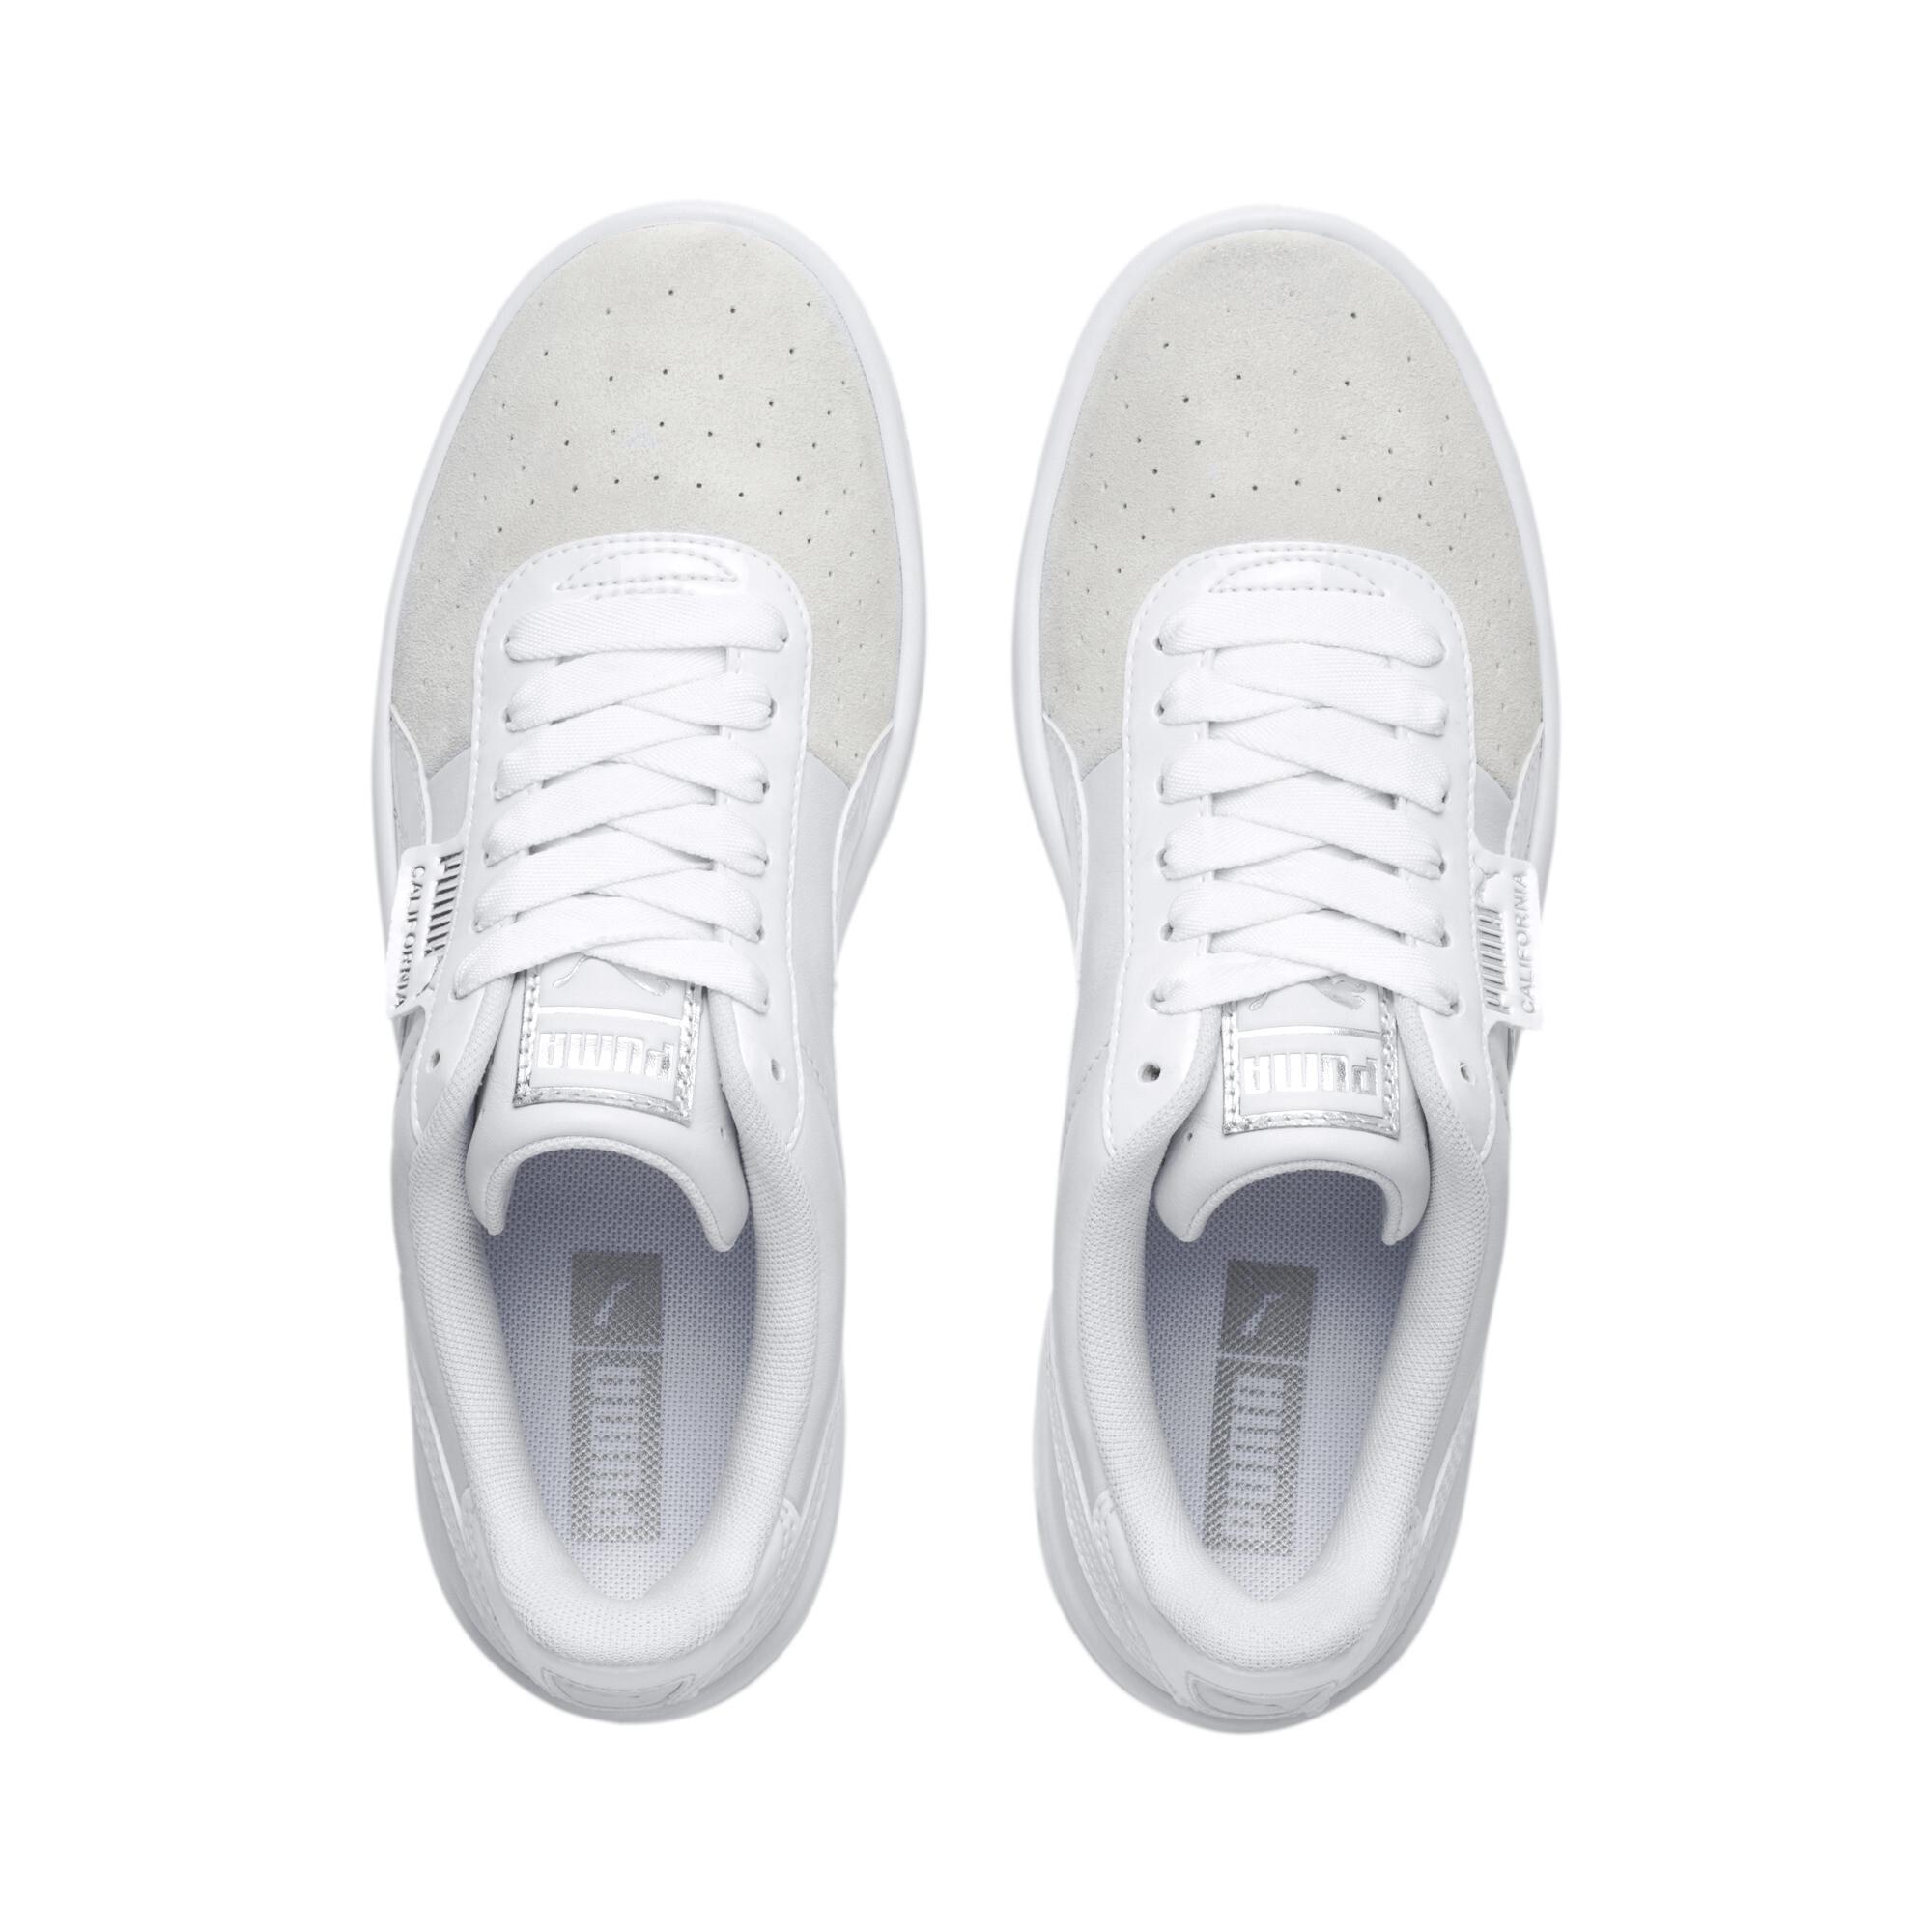 PUMA-Women-039-s-California-Monochrome-Sneakers thumbnail 13